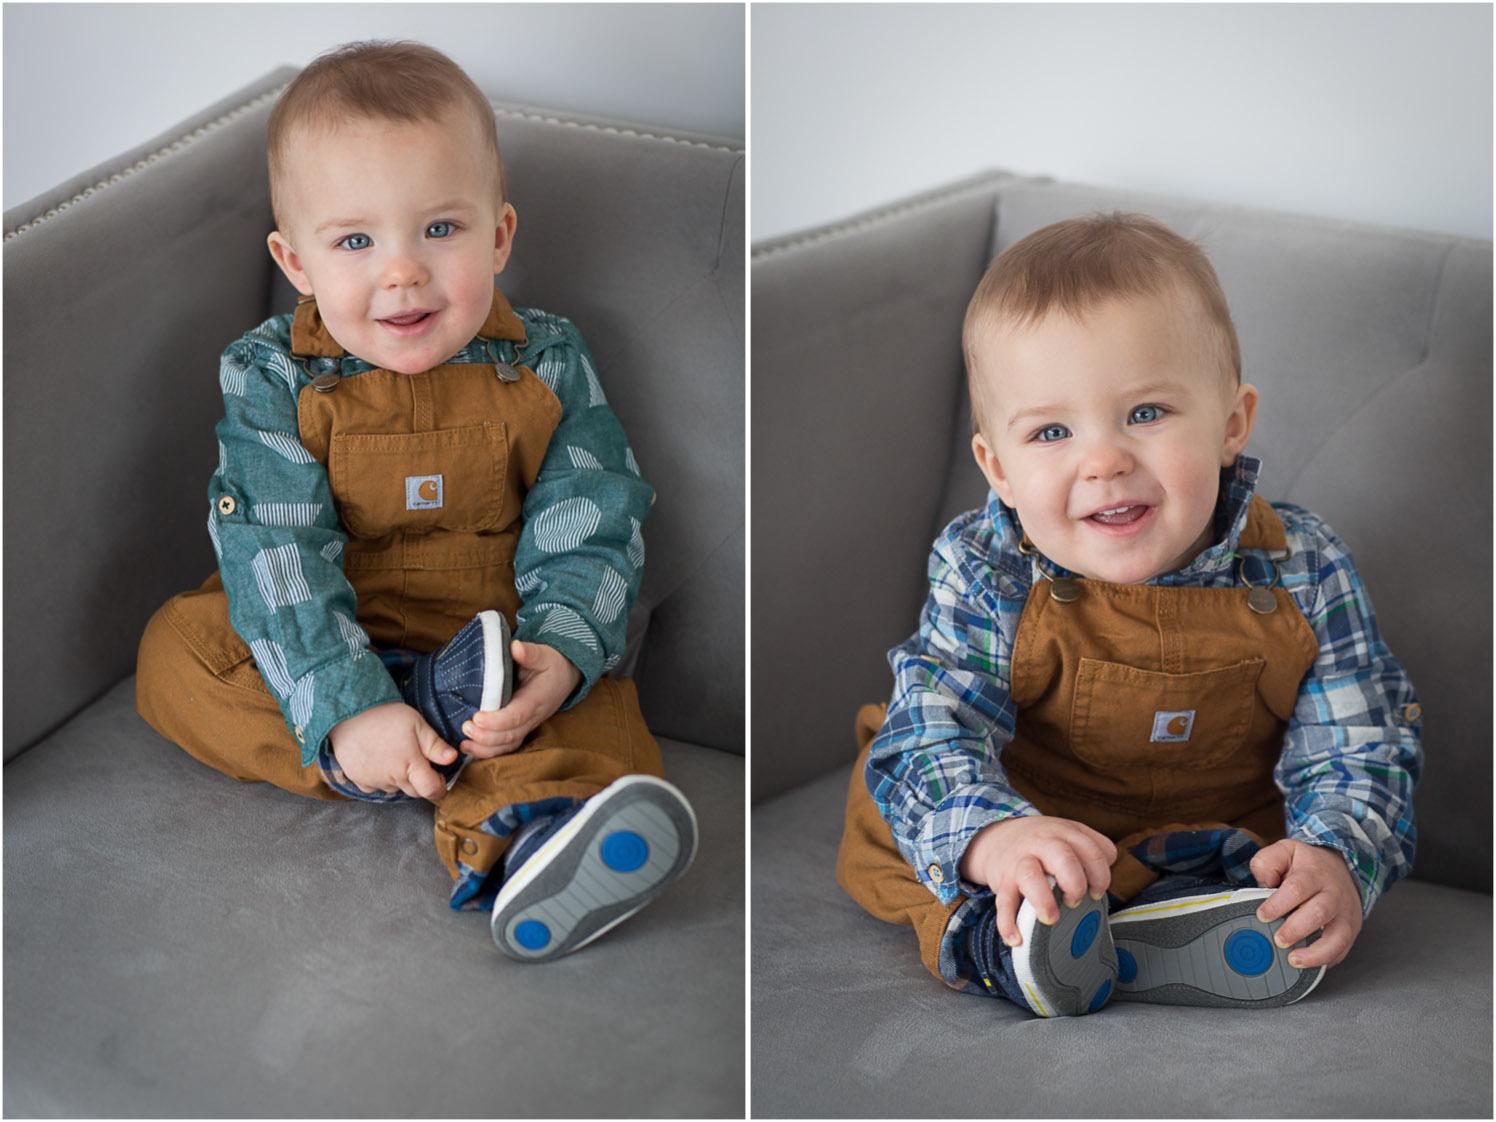 02-twin-boys-one-year-photo-session-studio-gray-couch-carhardt-overalls-block-studios-minnesota-mahonen-photography.jpg